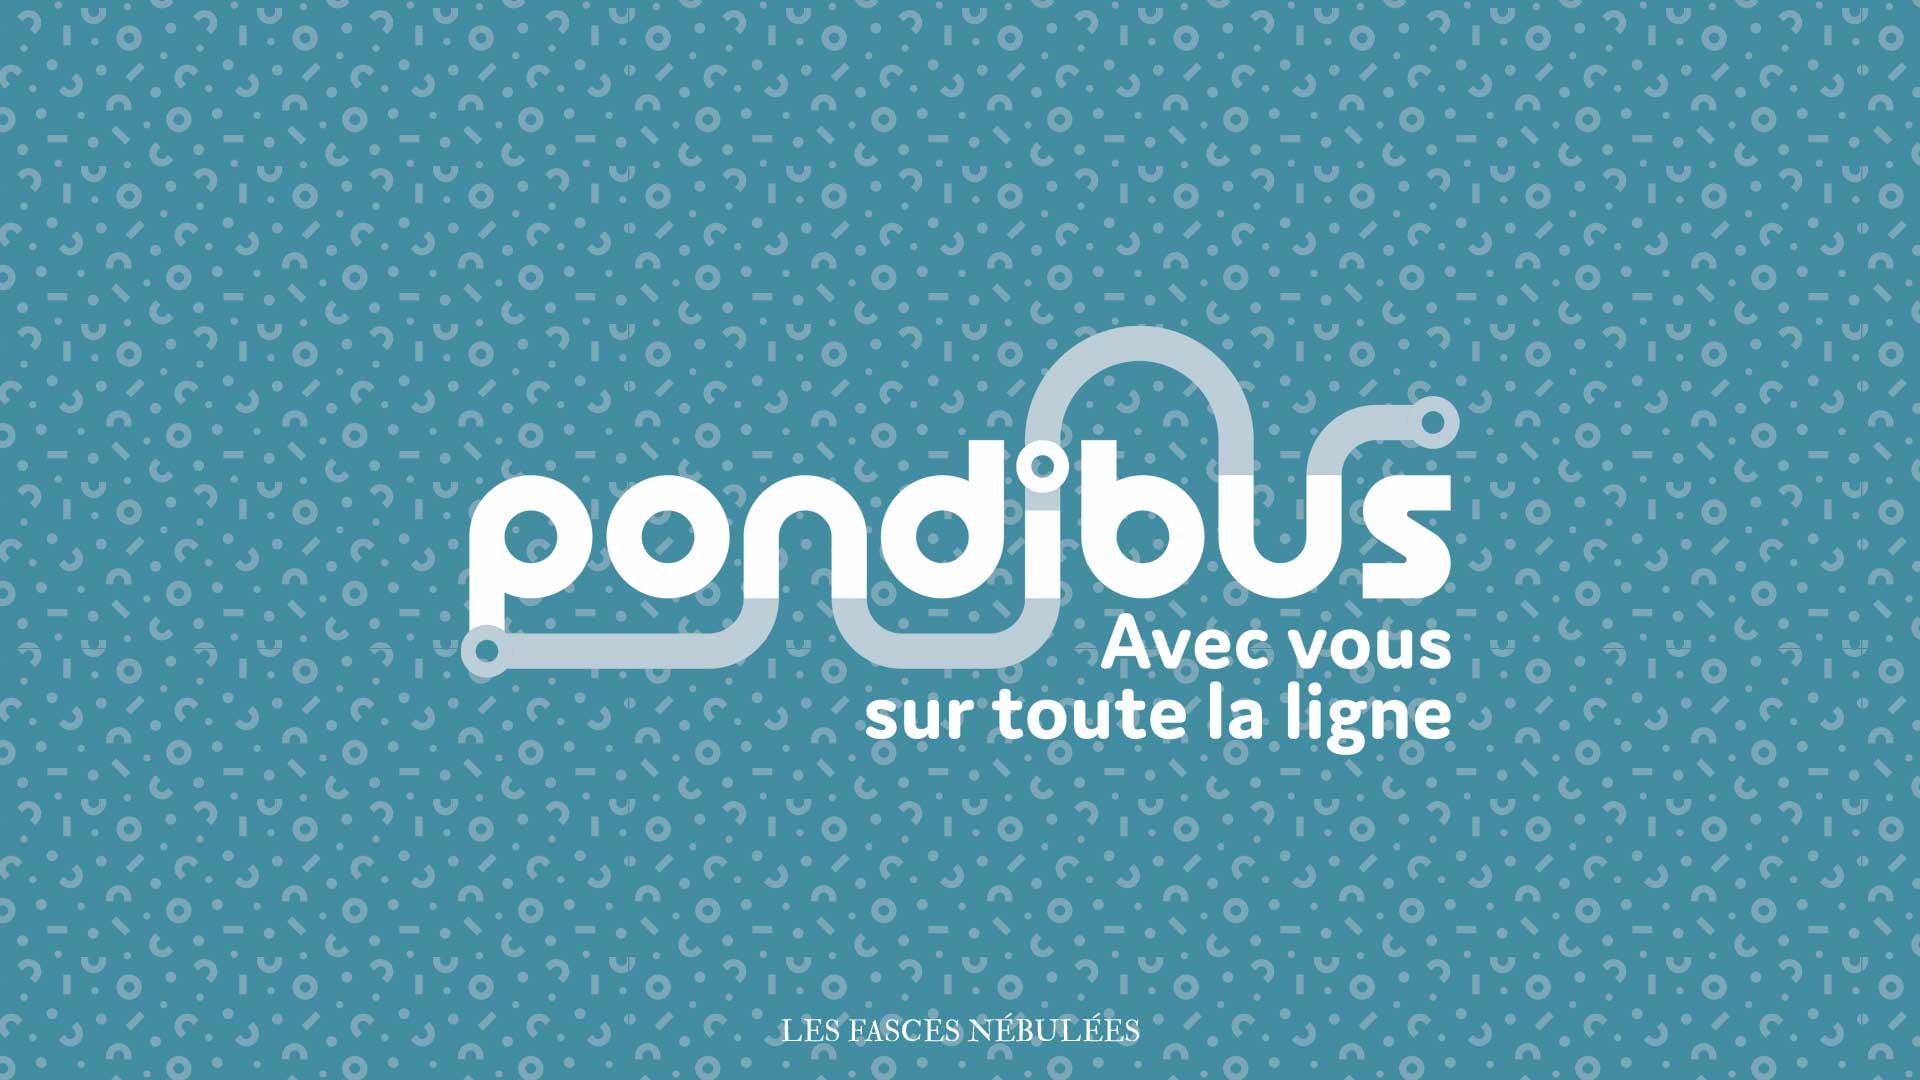 Pondibus</br> Transport en commun